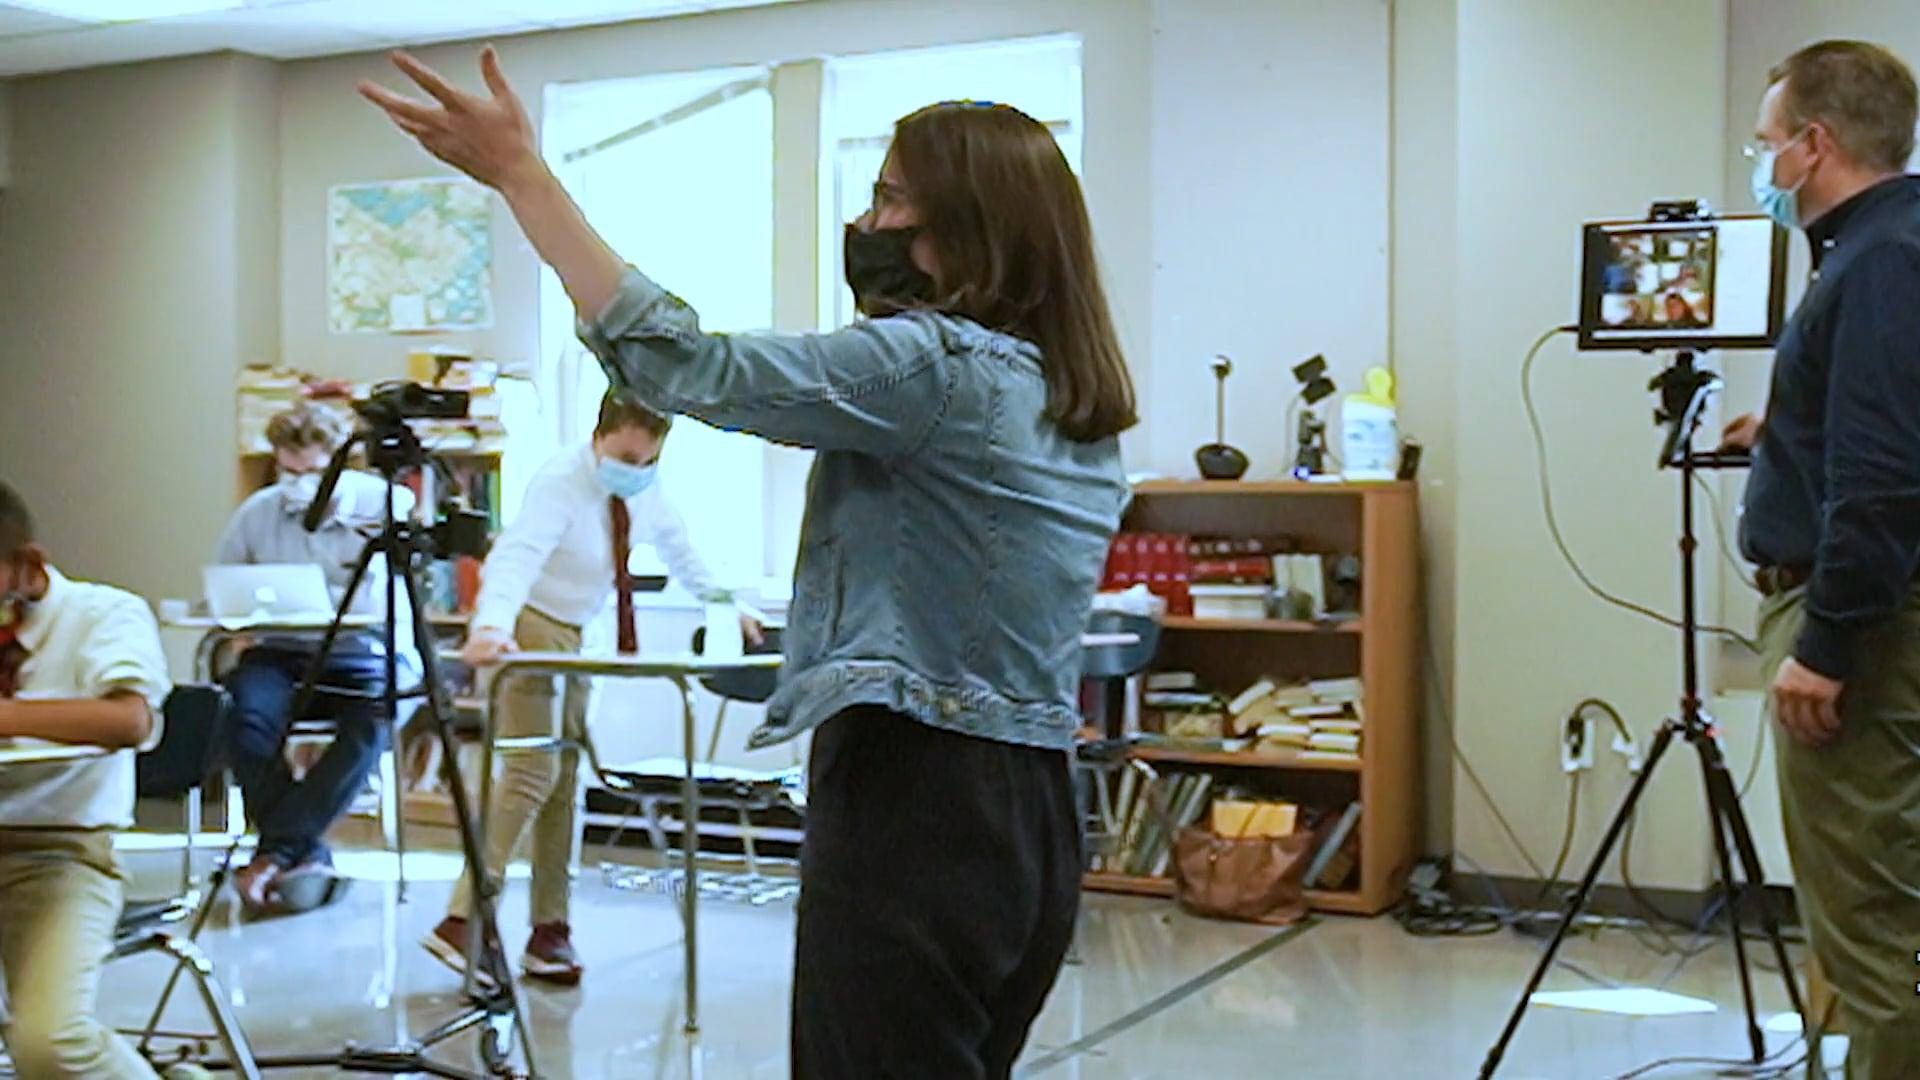 Partnership between Teaching with Technology and Saint Paul's Choir School